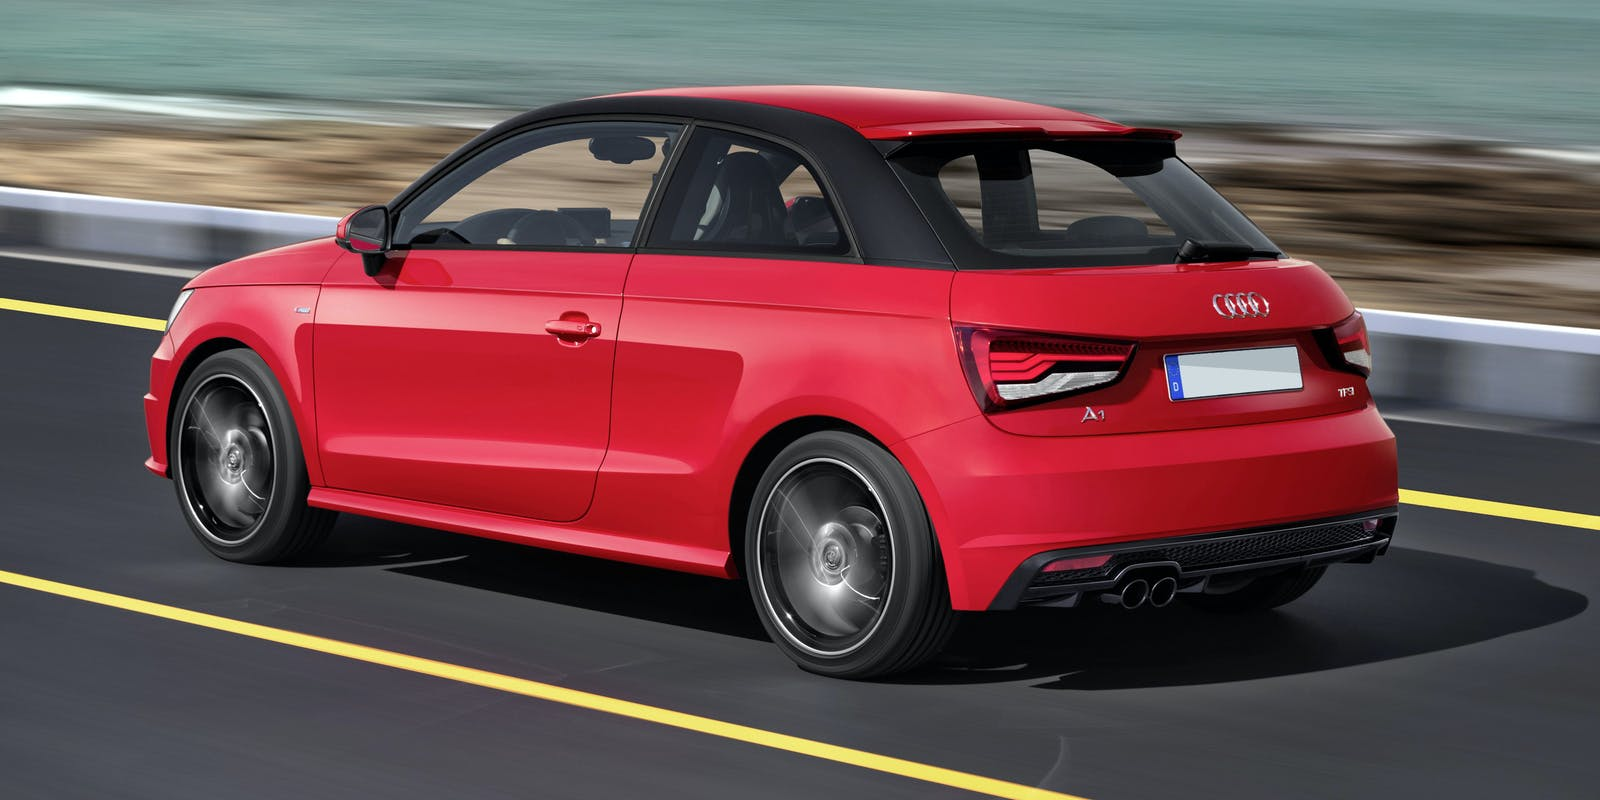 review car audi a1 hatchback 2017 review mat watson autos post. Black Bedroom Furniture Sets. Home Design Ideas